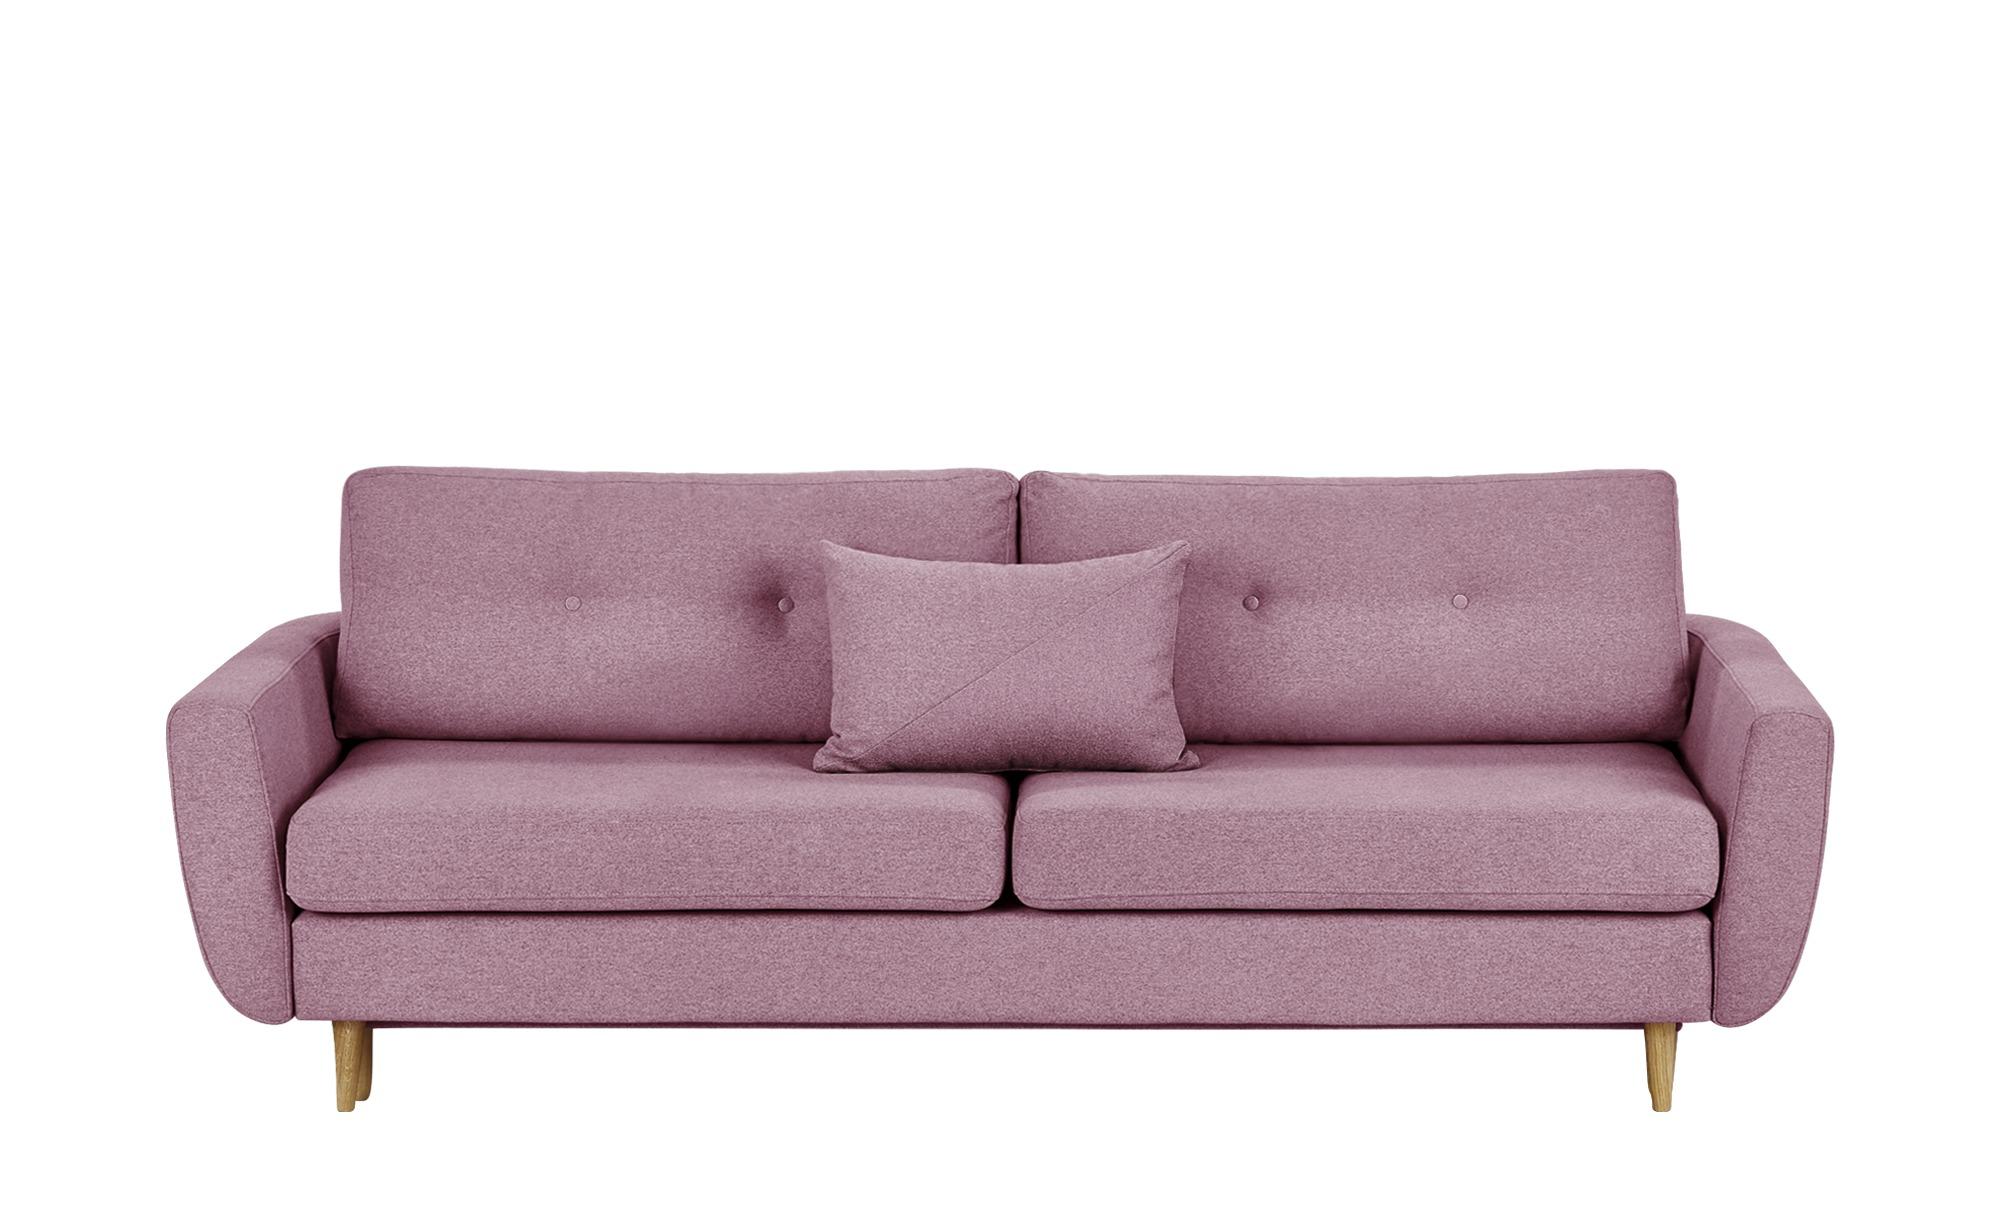 finya Schlafsofa, 3-sitzig pink - Webstoff Harris ¦ rosa/pink ¦ Maße (cm): B: 231 H: 85 T: 92 Polstermöbel > Sofas > 3-Sitzer - Höffner